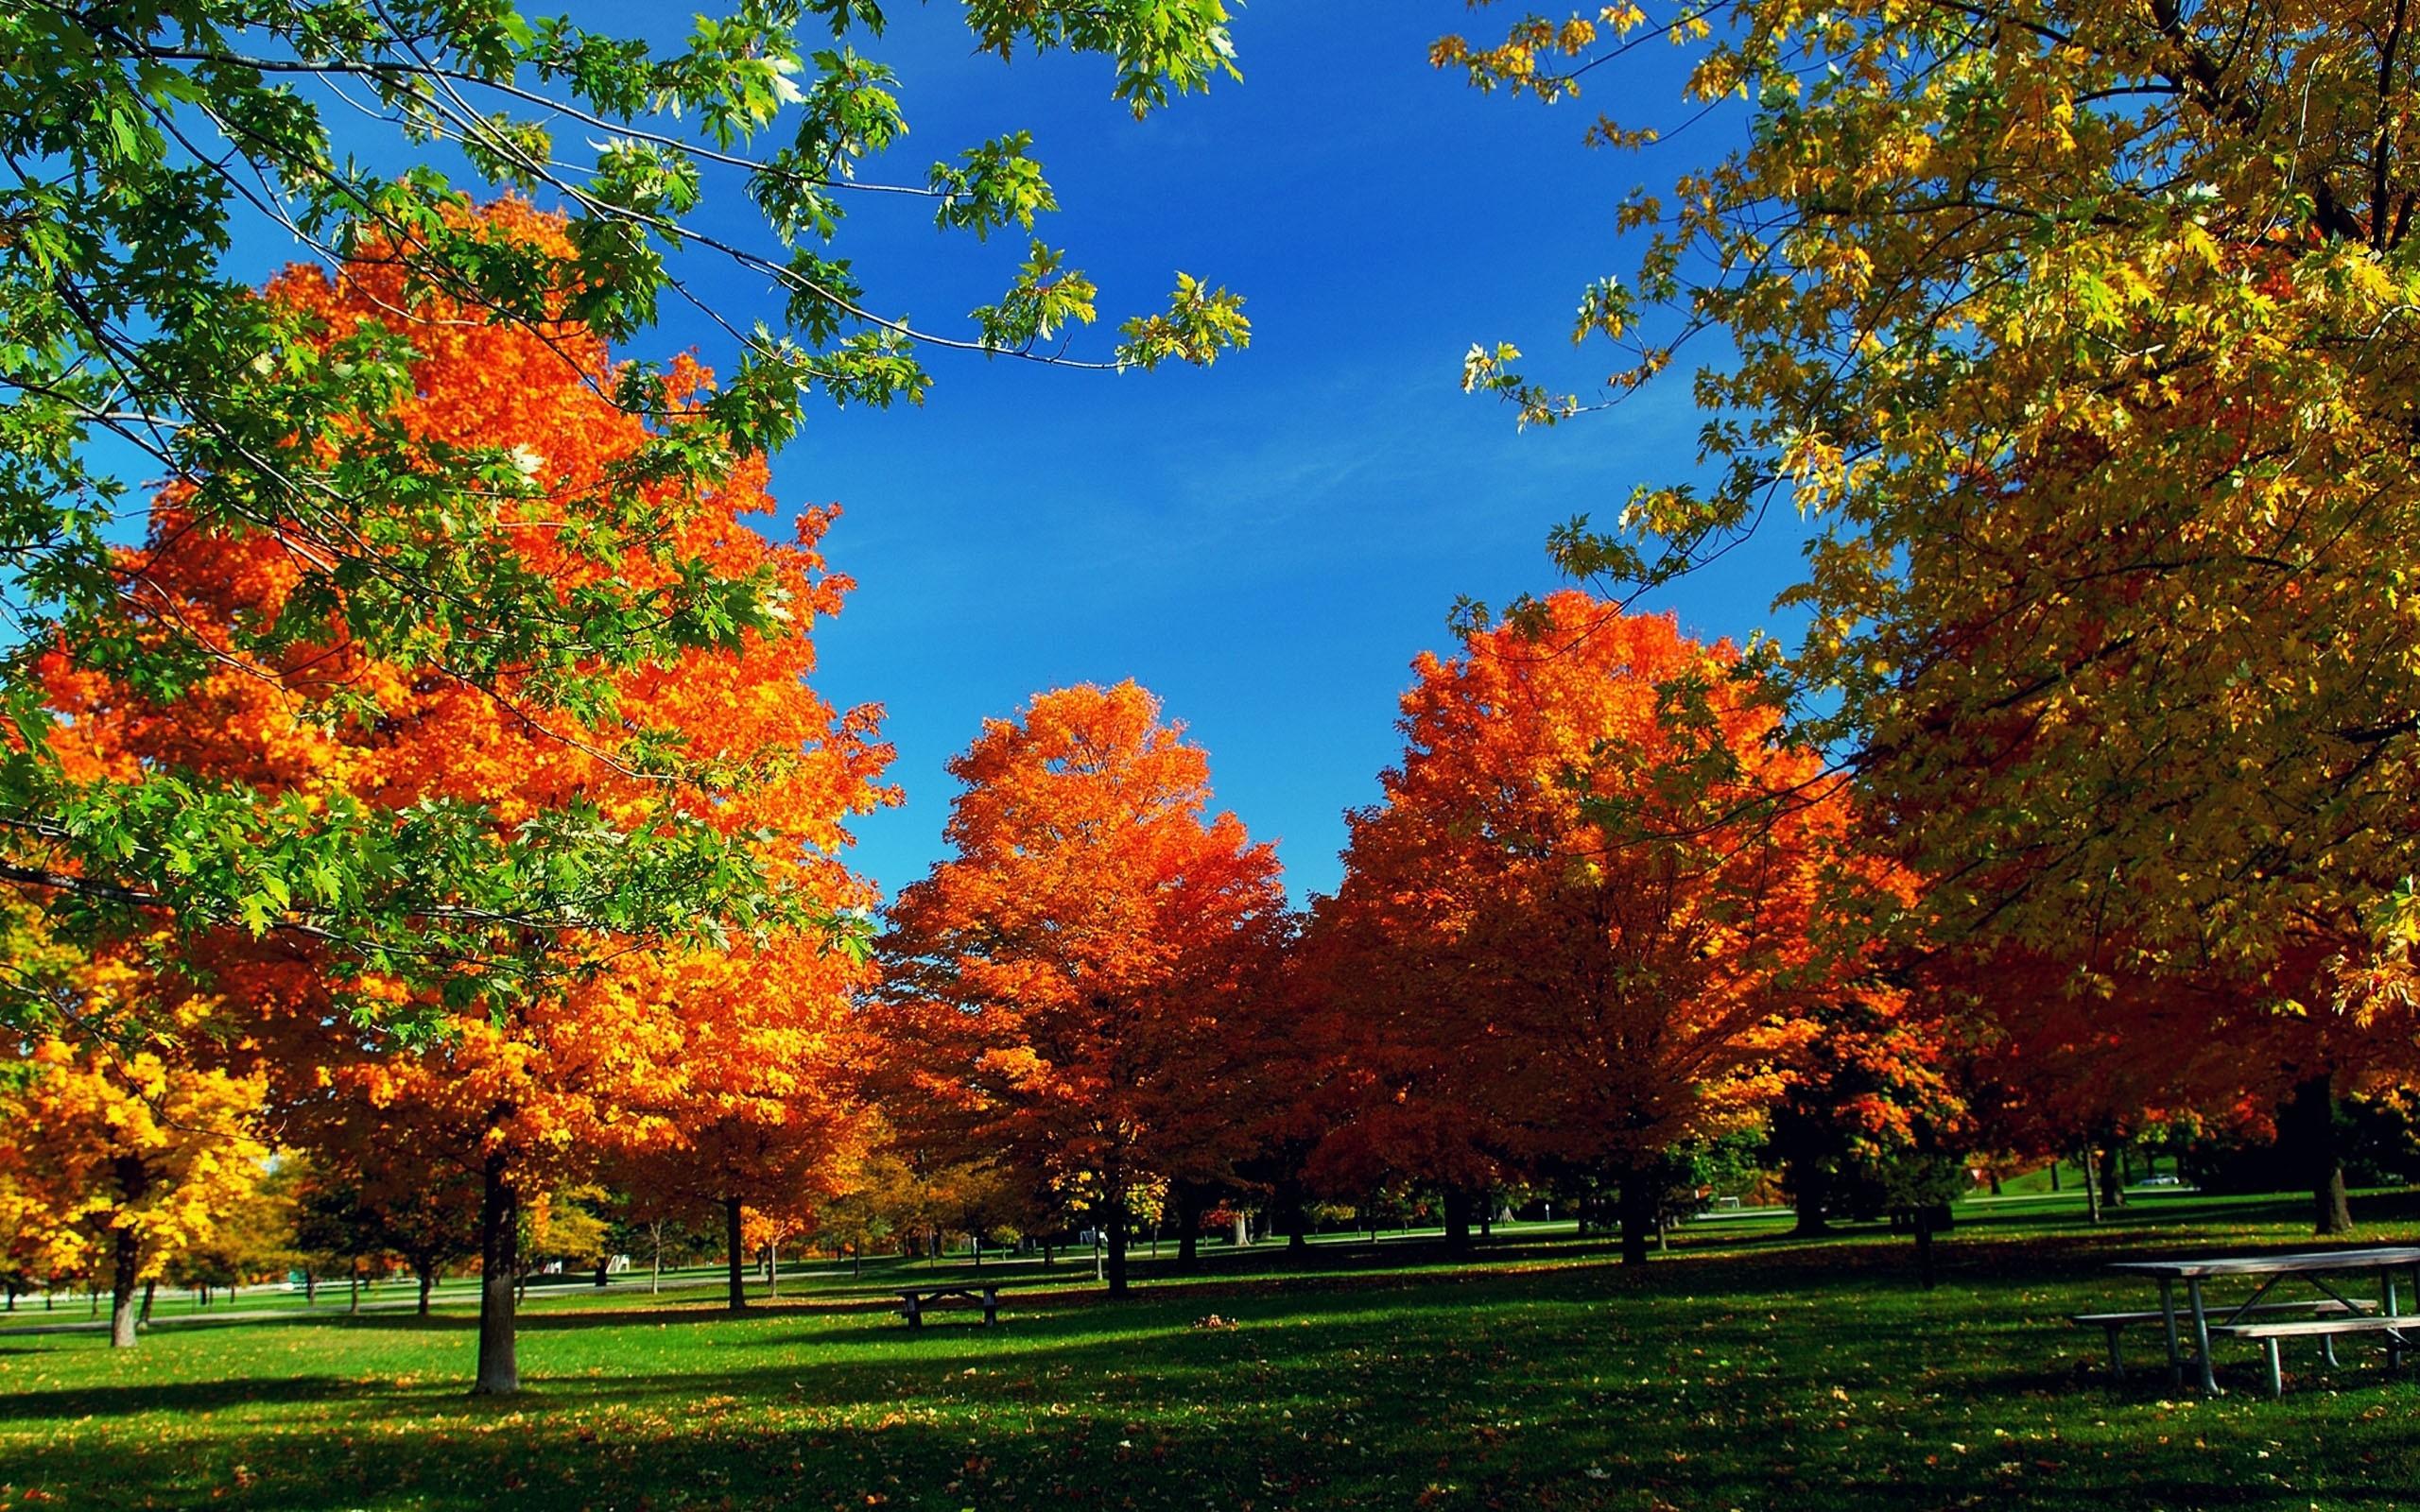 Autumn Wallpaper Widescreen 1 Download Free Amazing High